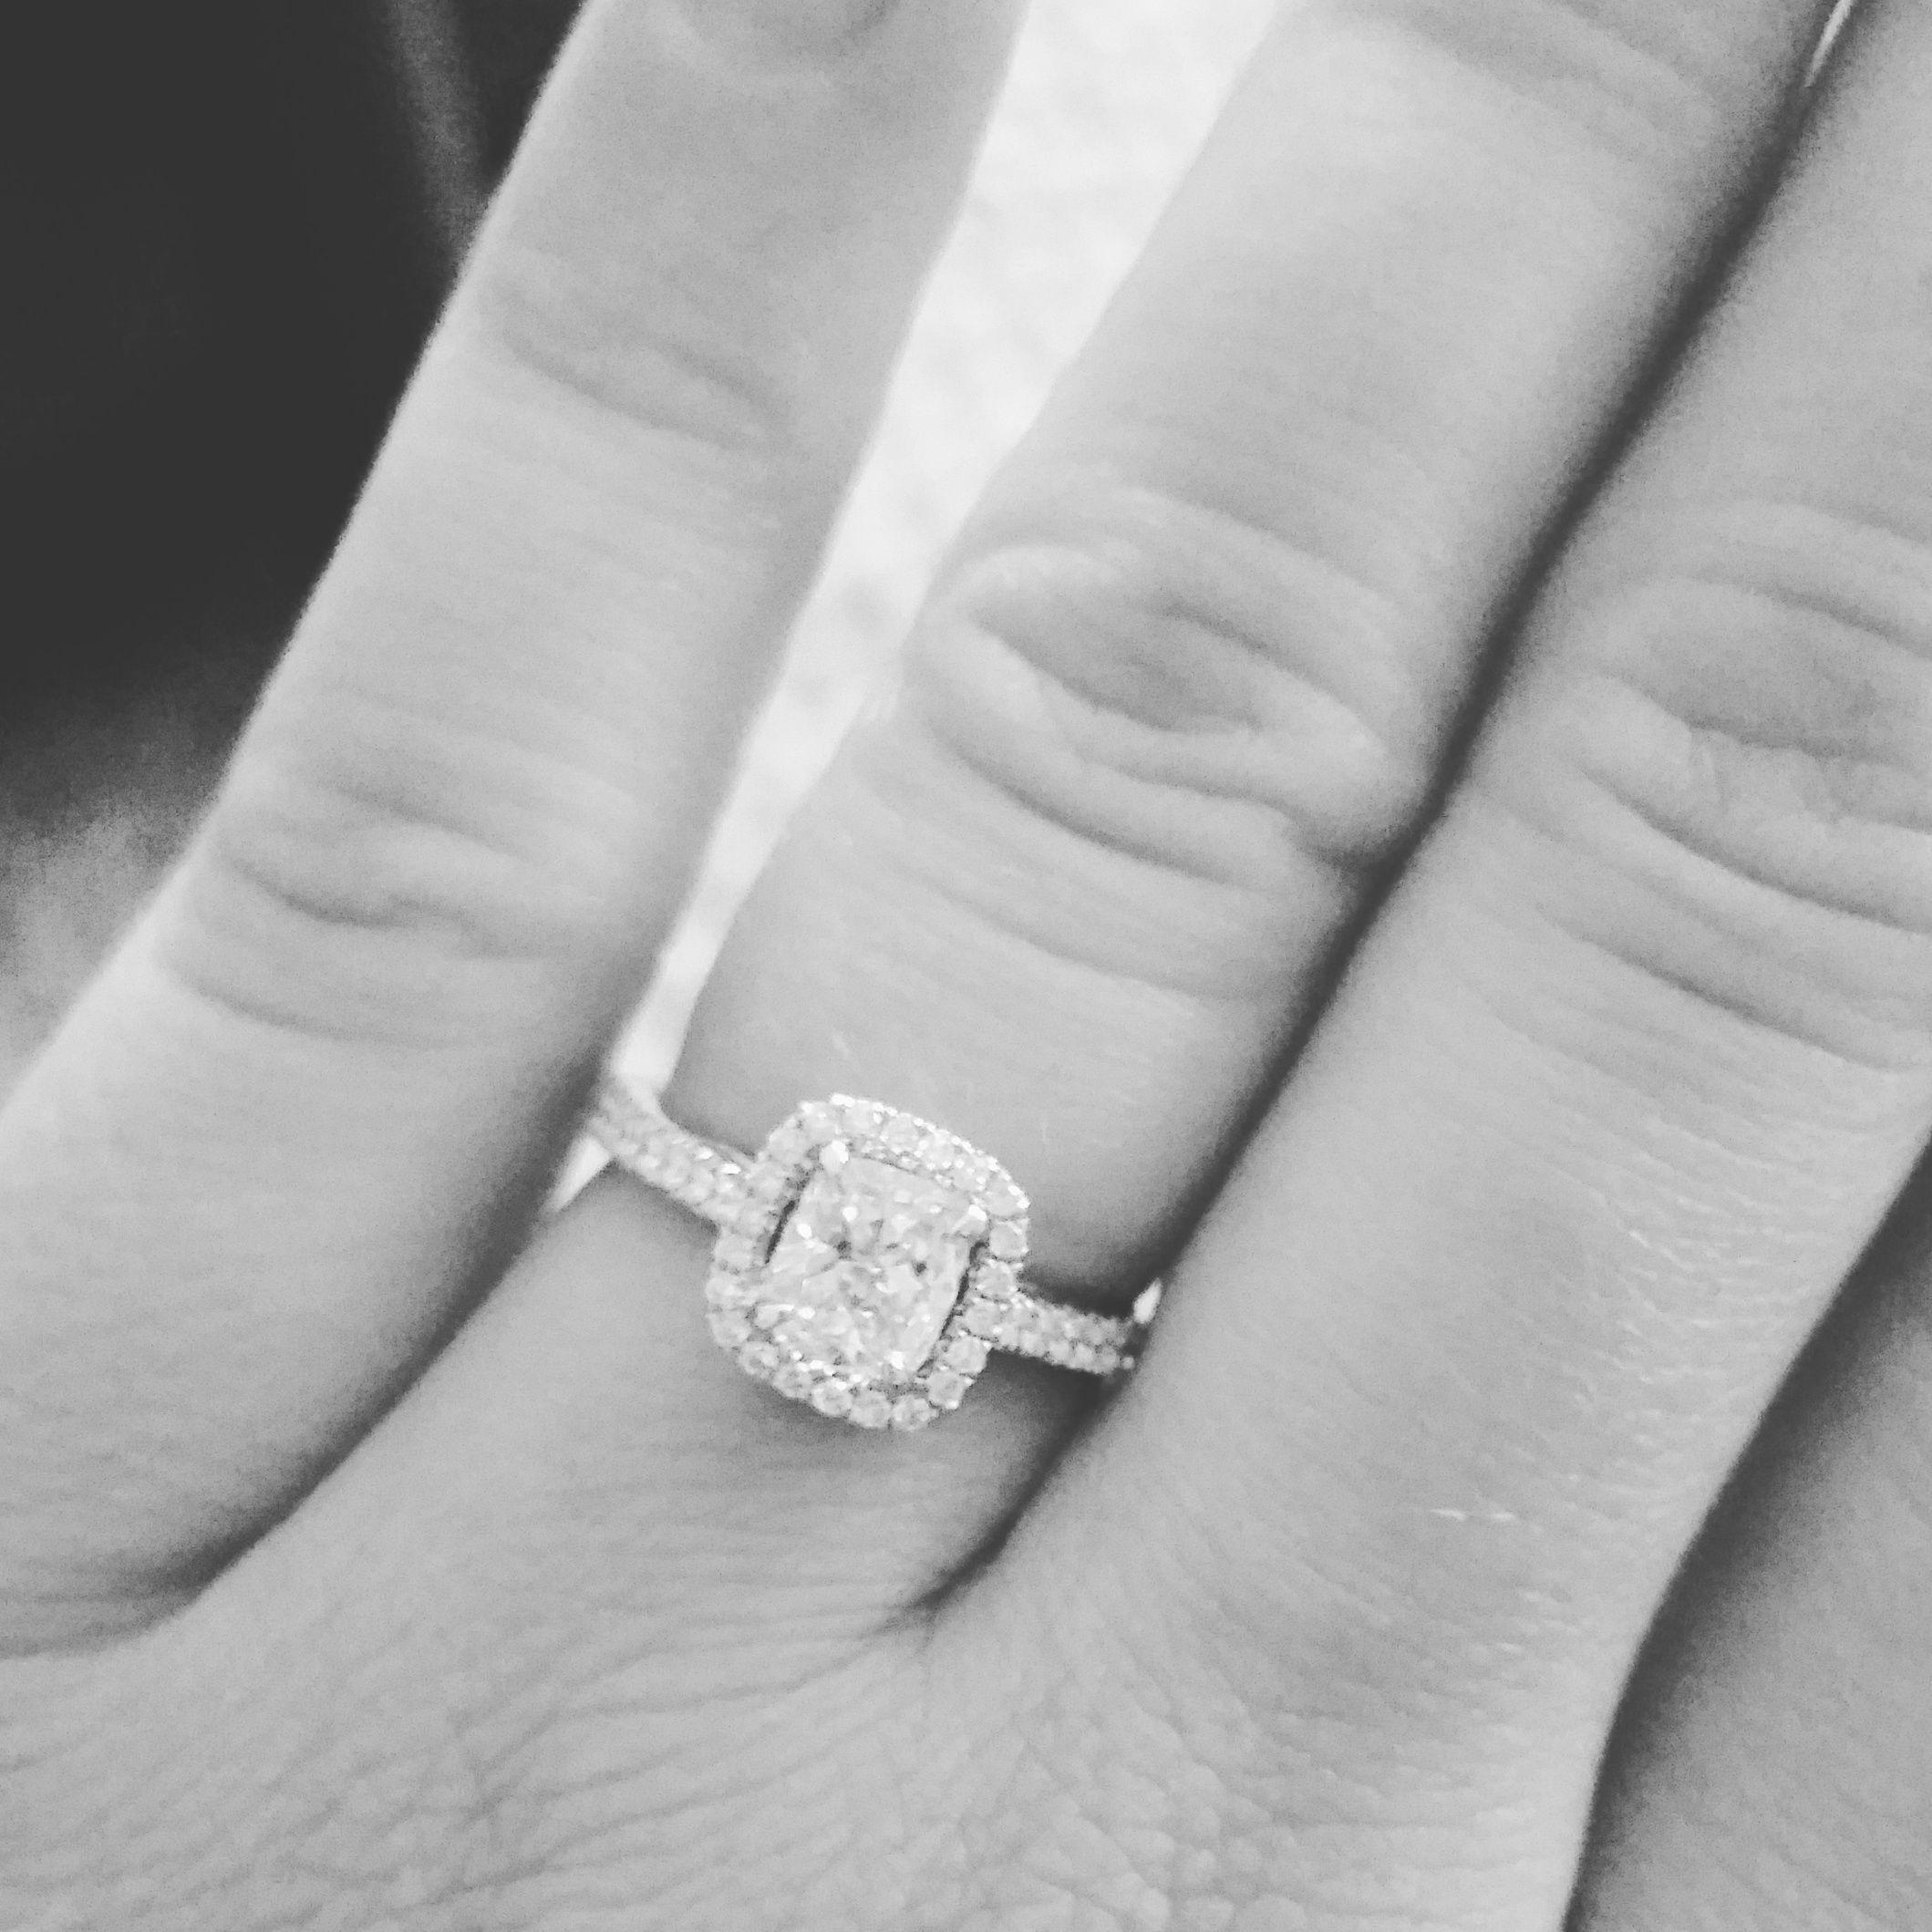 Custom Designed 1k Diamond Engagement Ring Cushion Cut W Halo